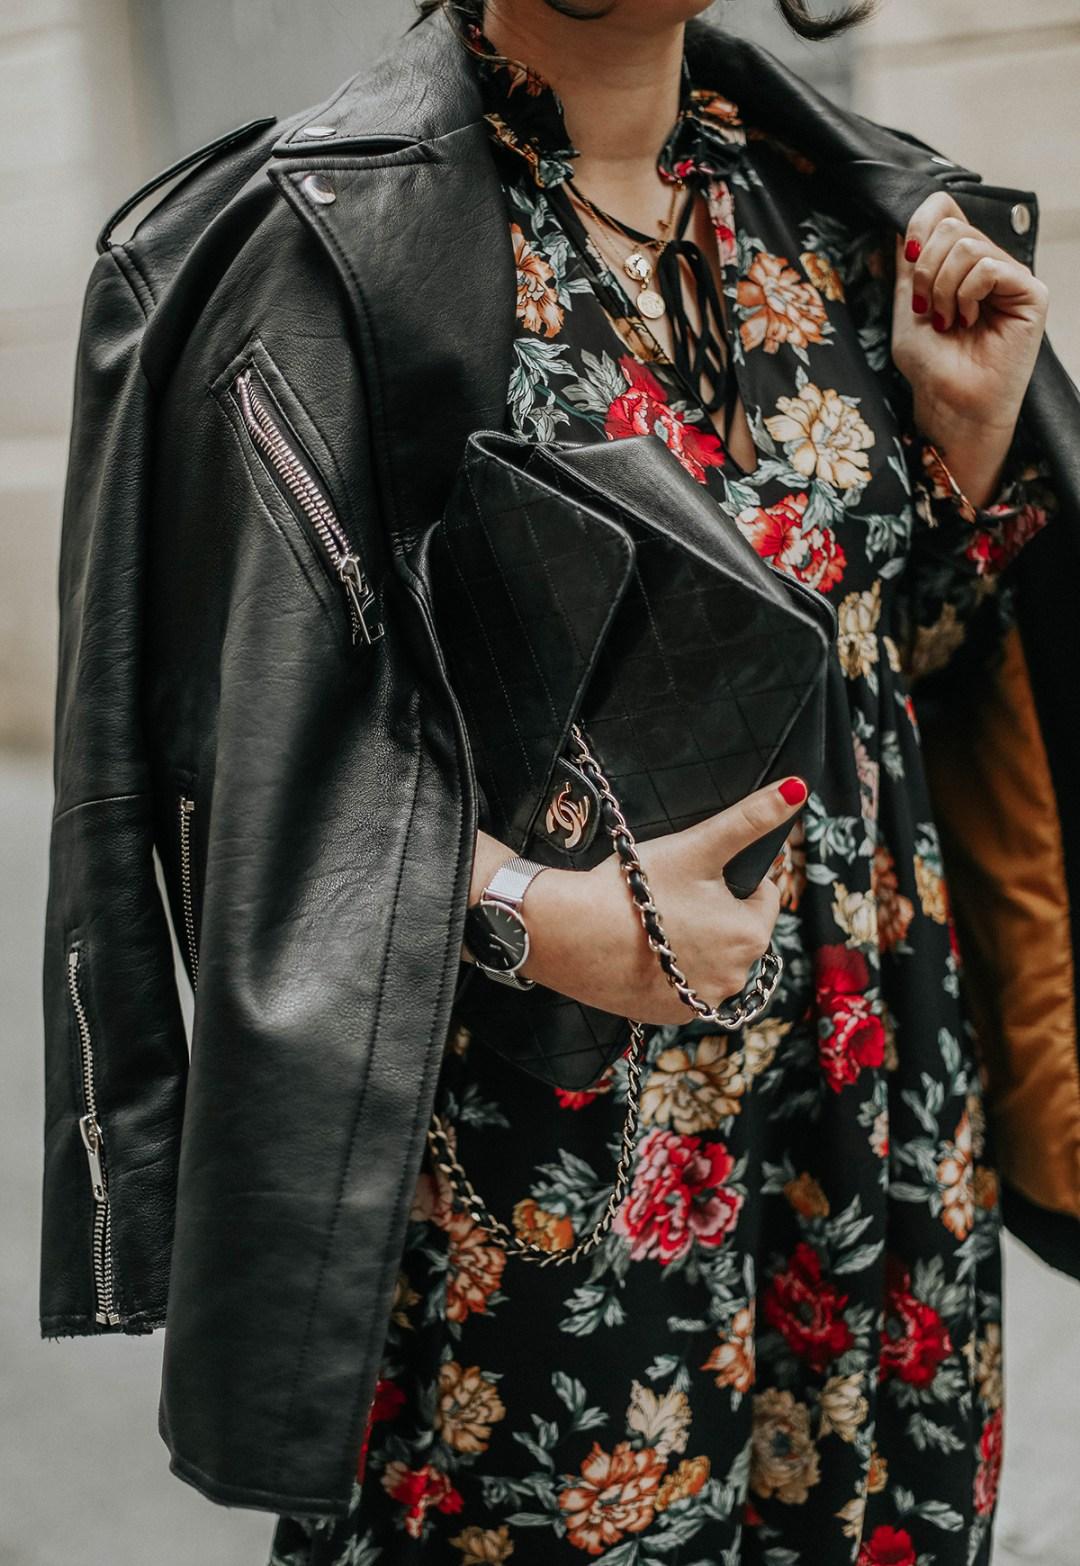 vestido-flores-midi-zara-botines-amazon-find-streetstyle10